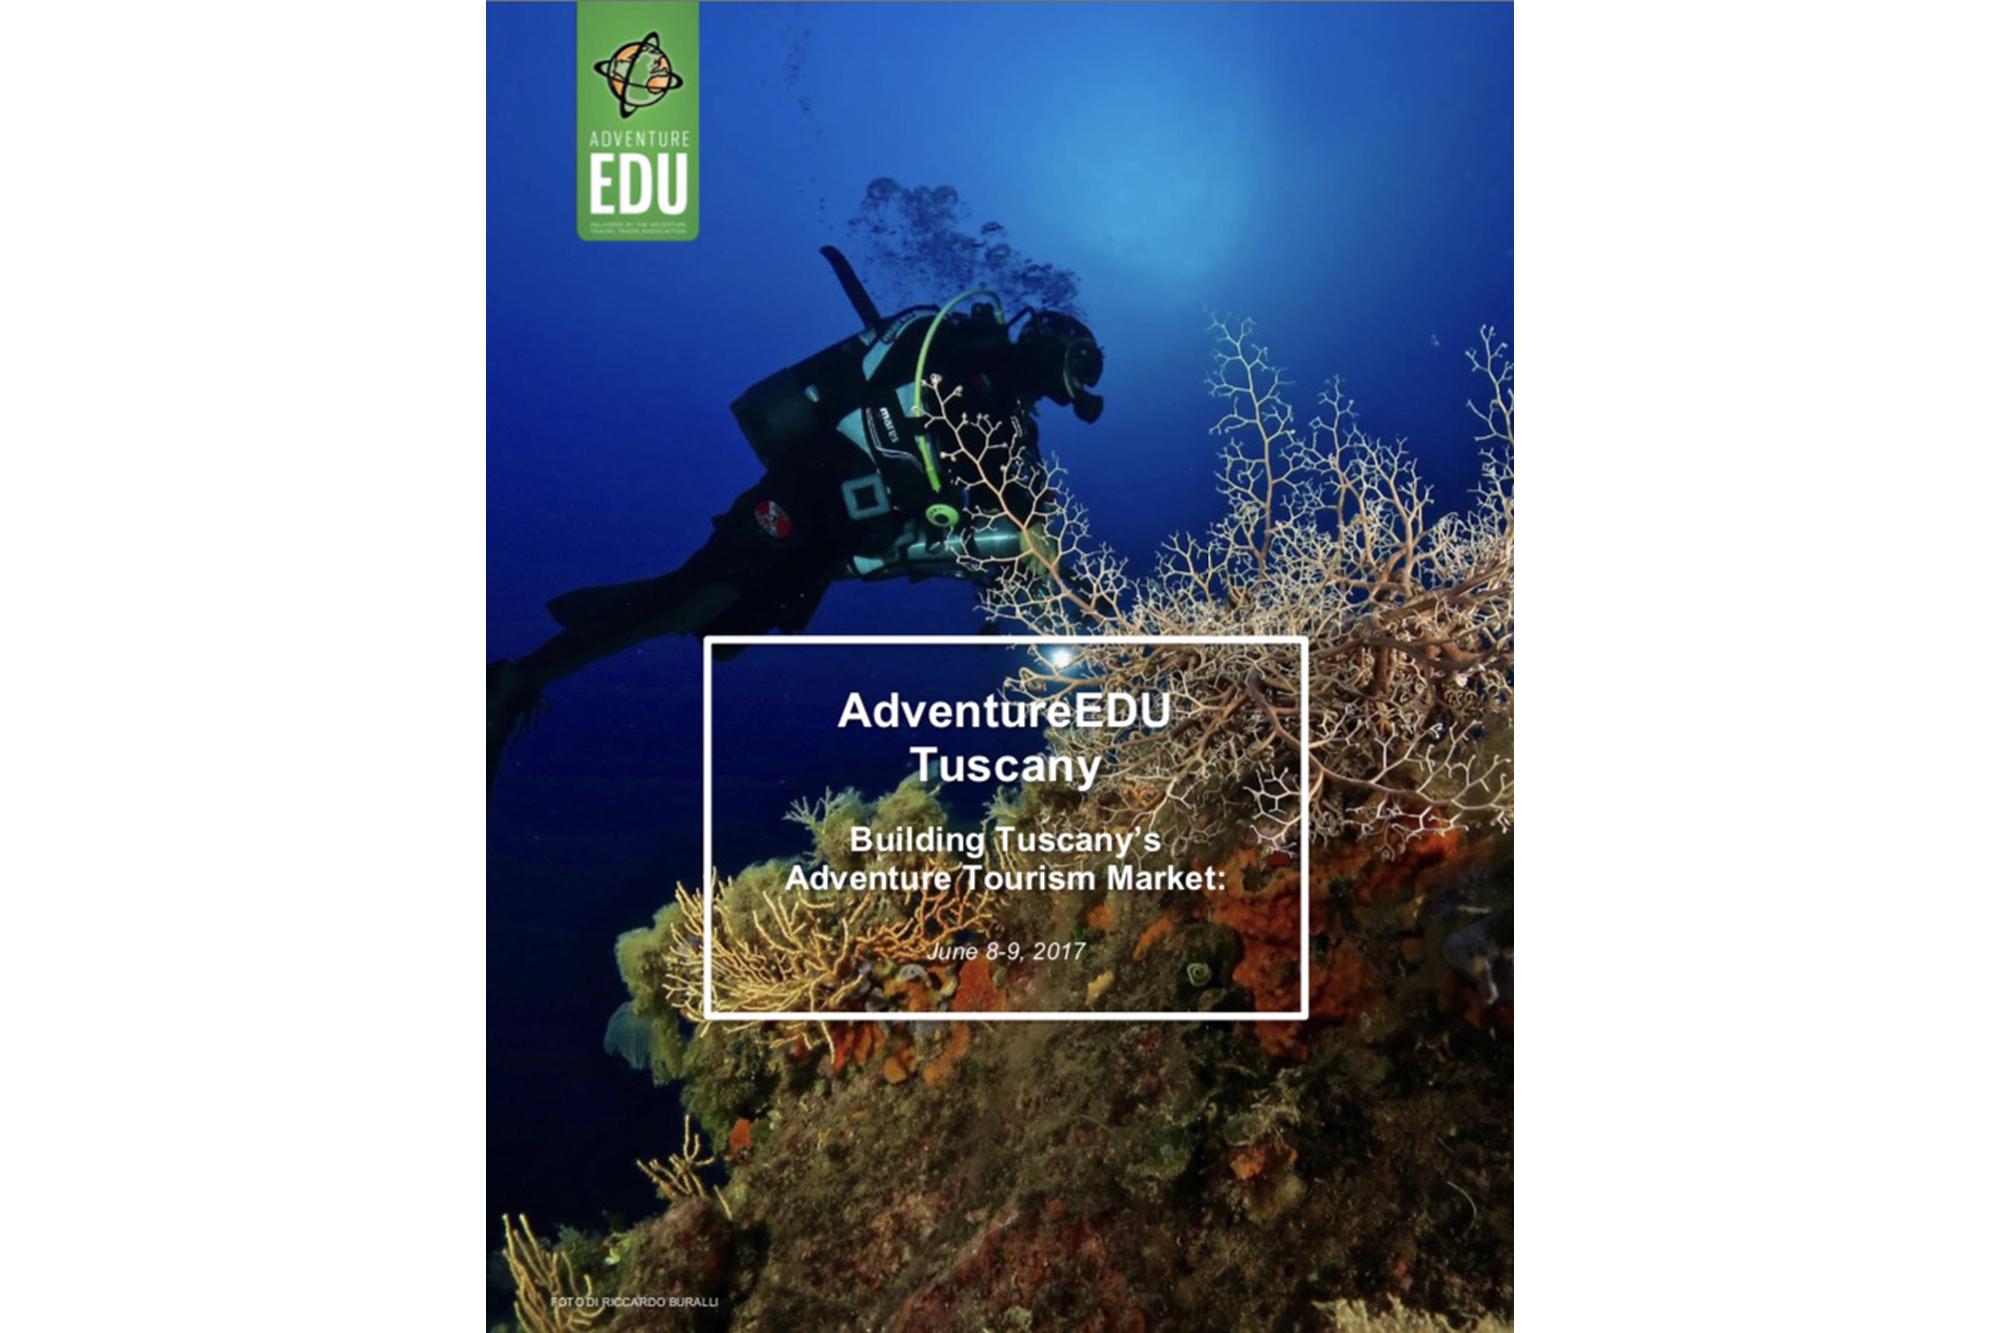 AdventureEDU by ATTA